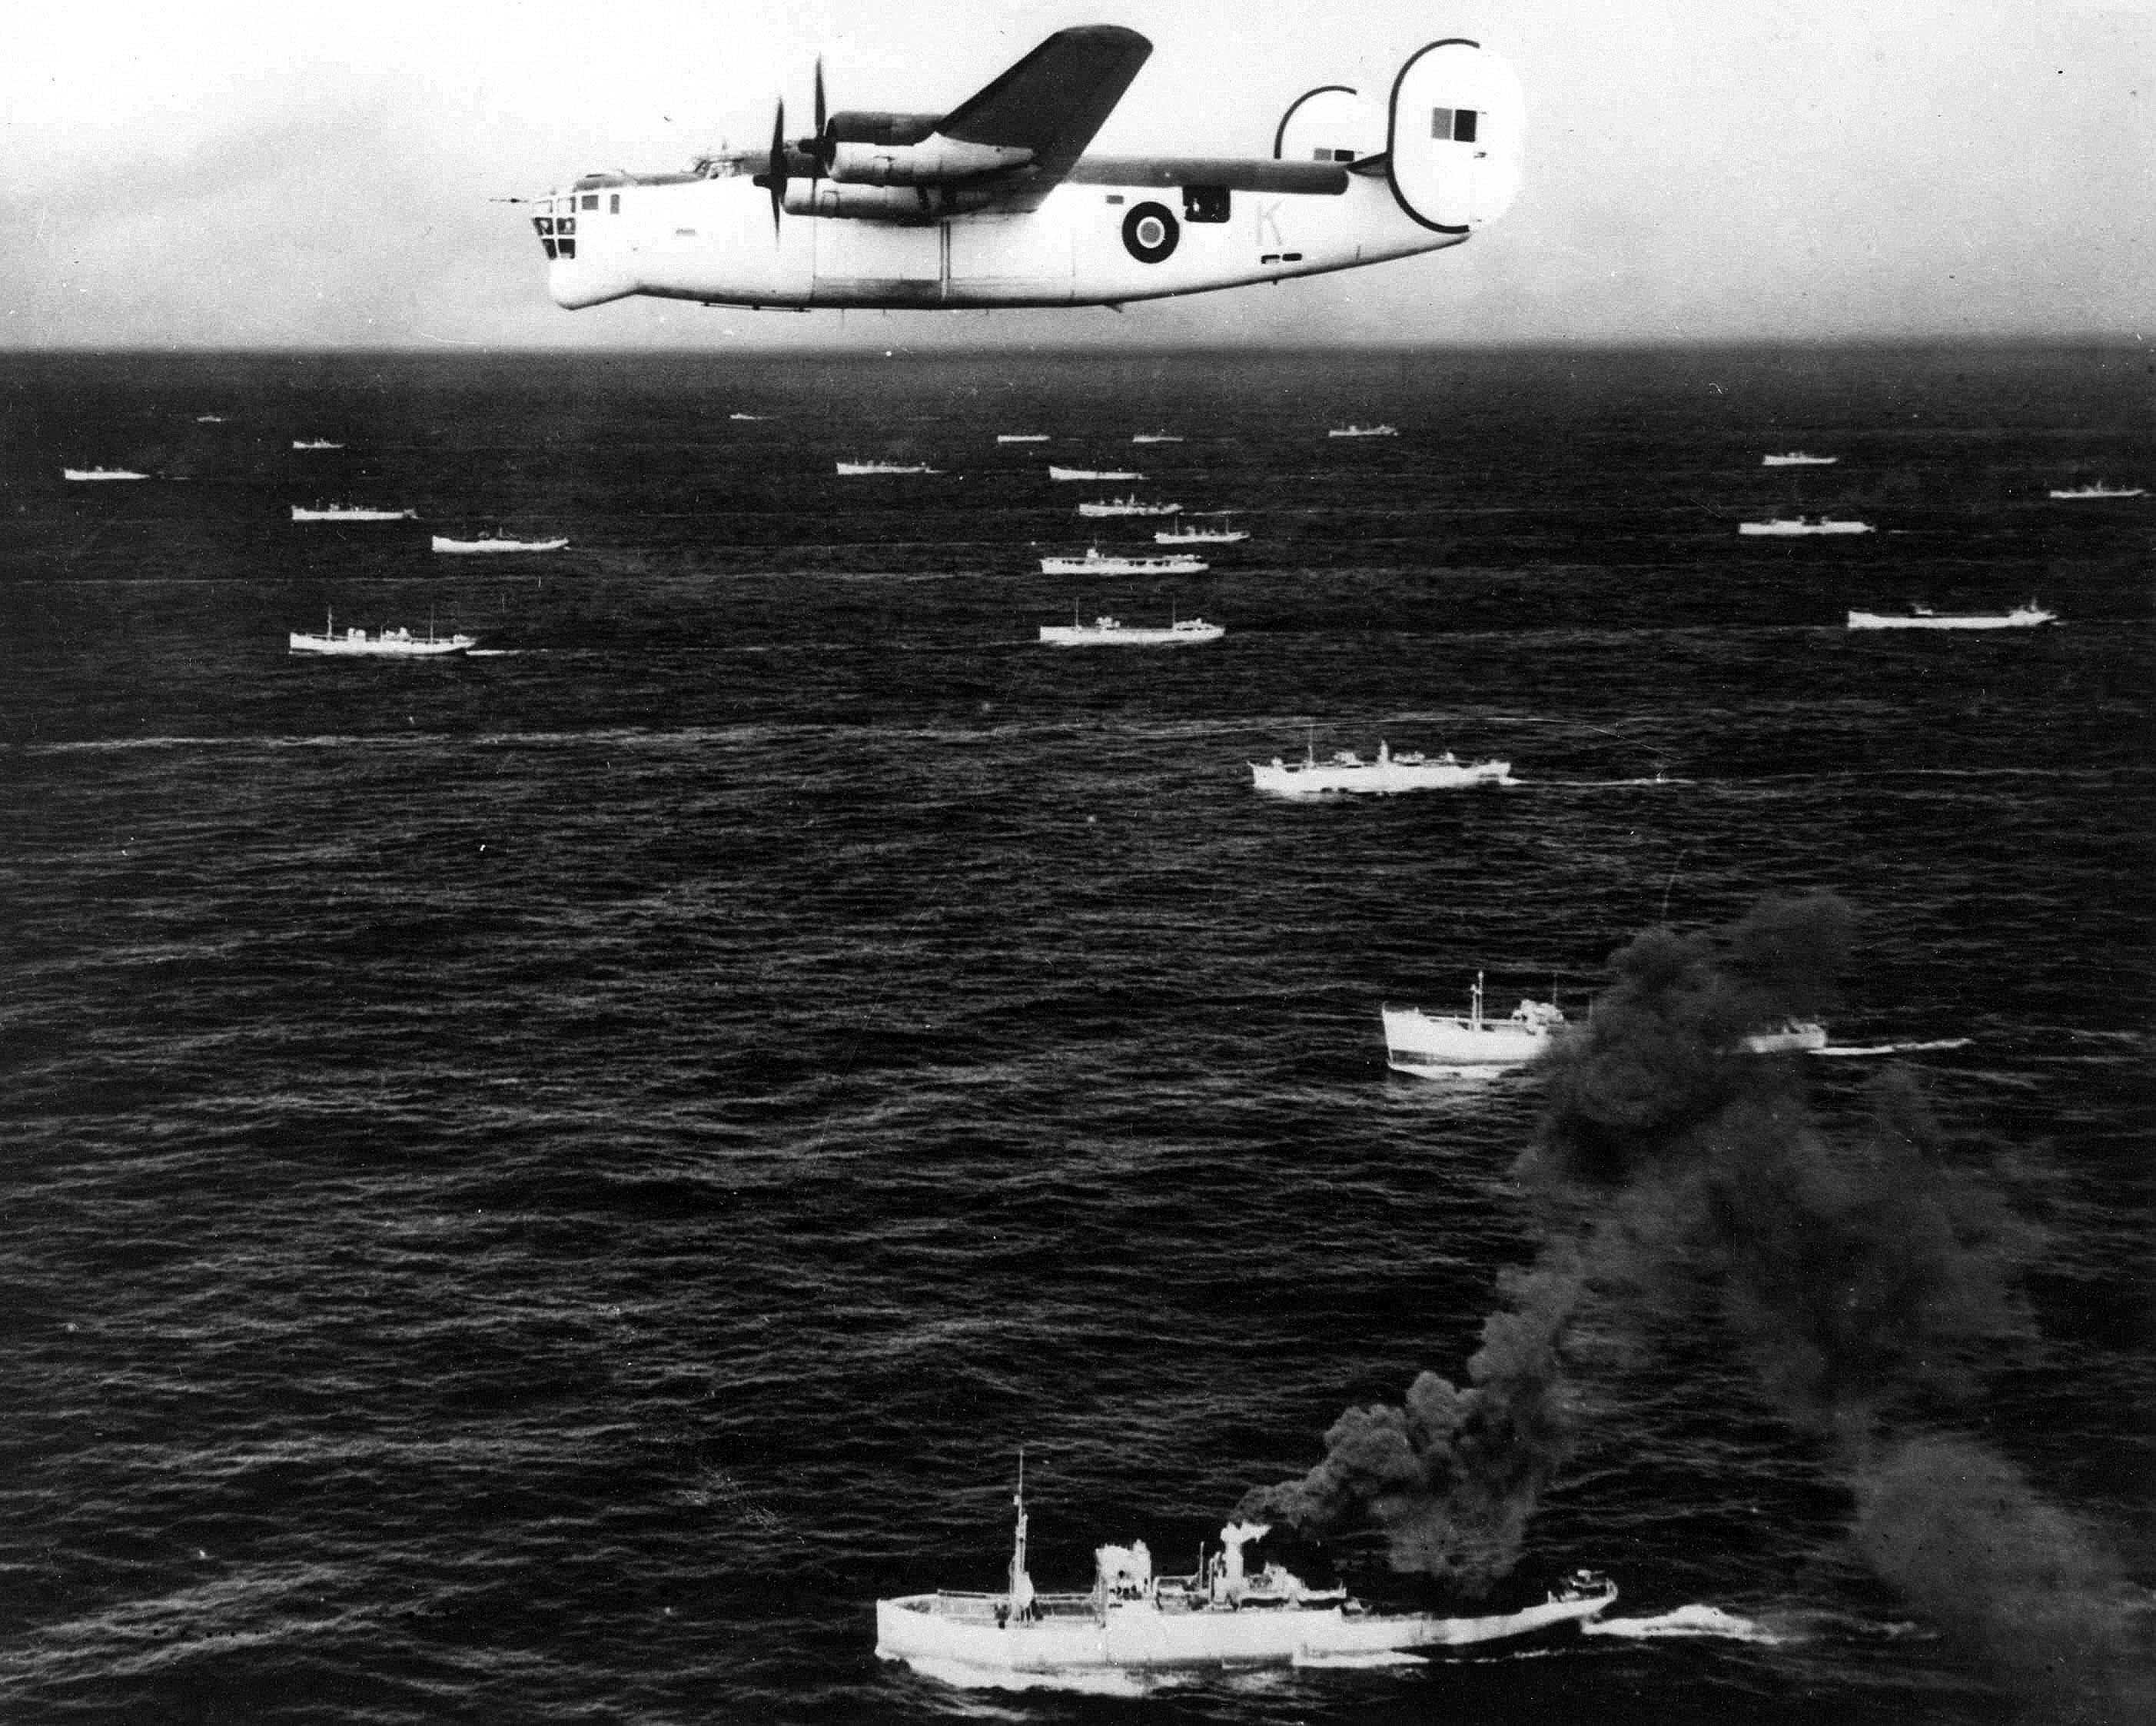 Photo of a B-24 Liberator.